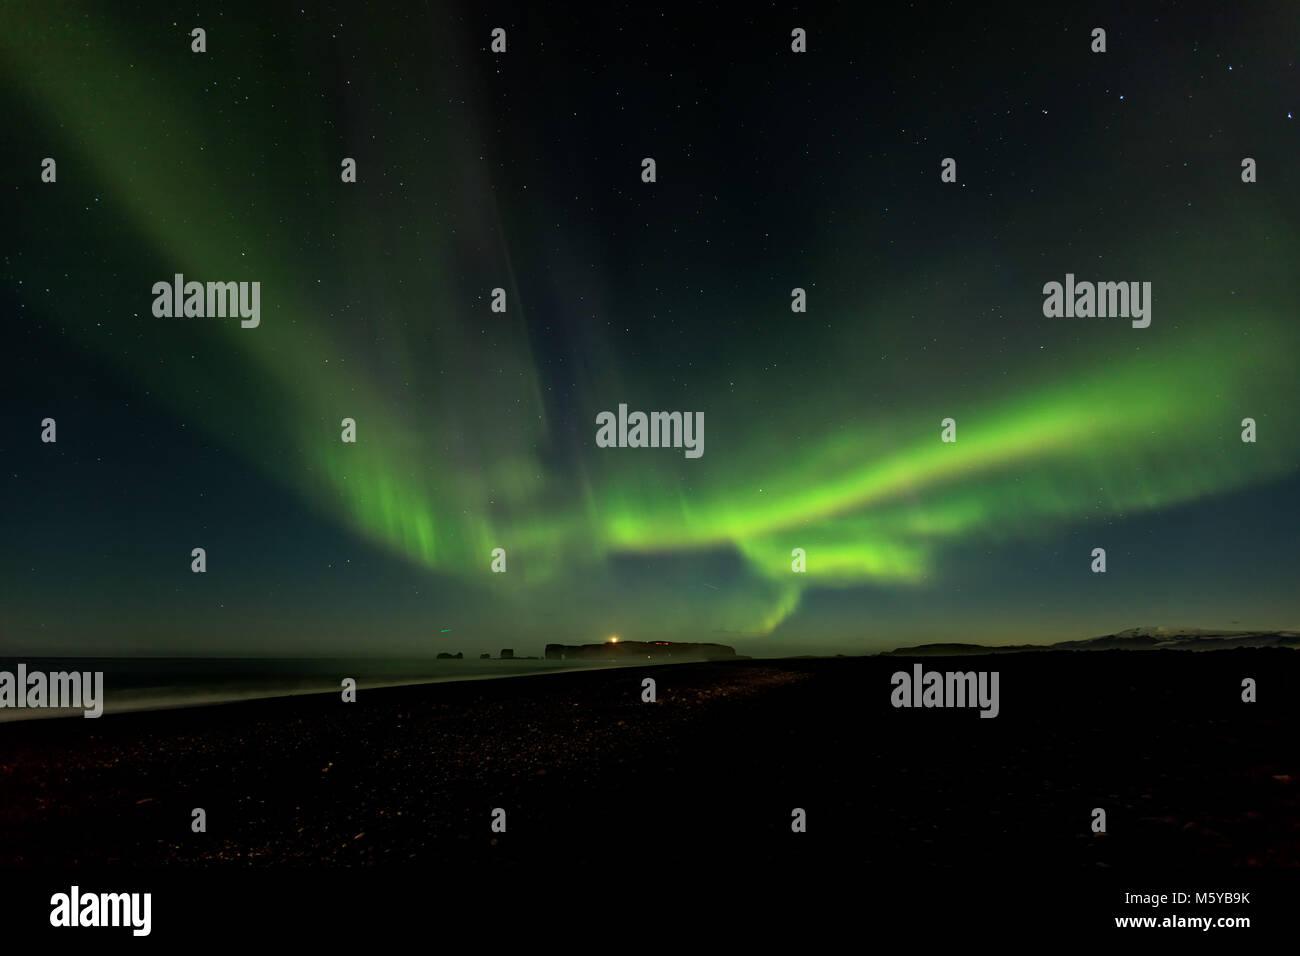 Aurora borealis, or Northern Lights, over Dyrholaey Peninsula and Reynisfjara Beach, Iceland - Stock Image